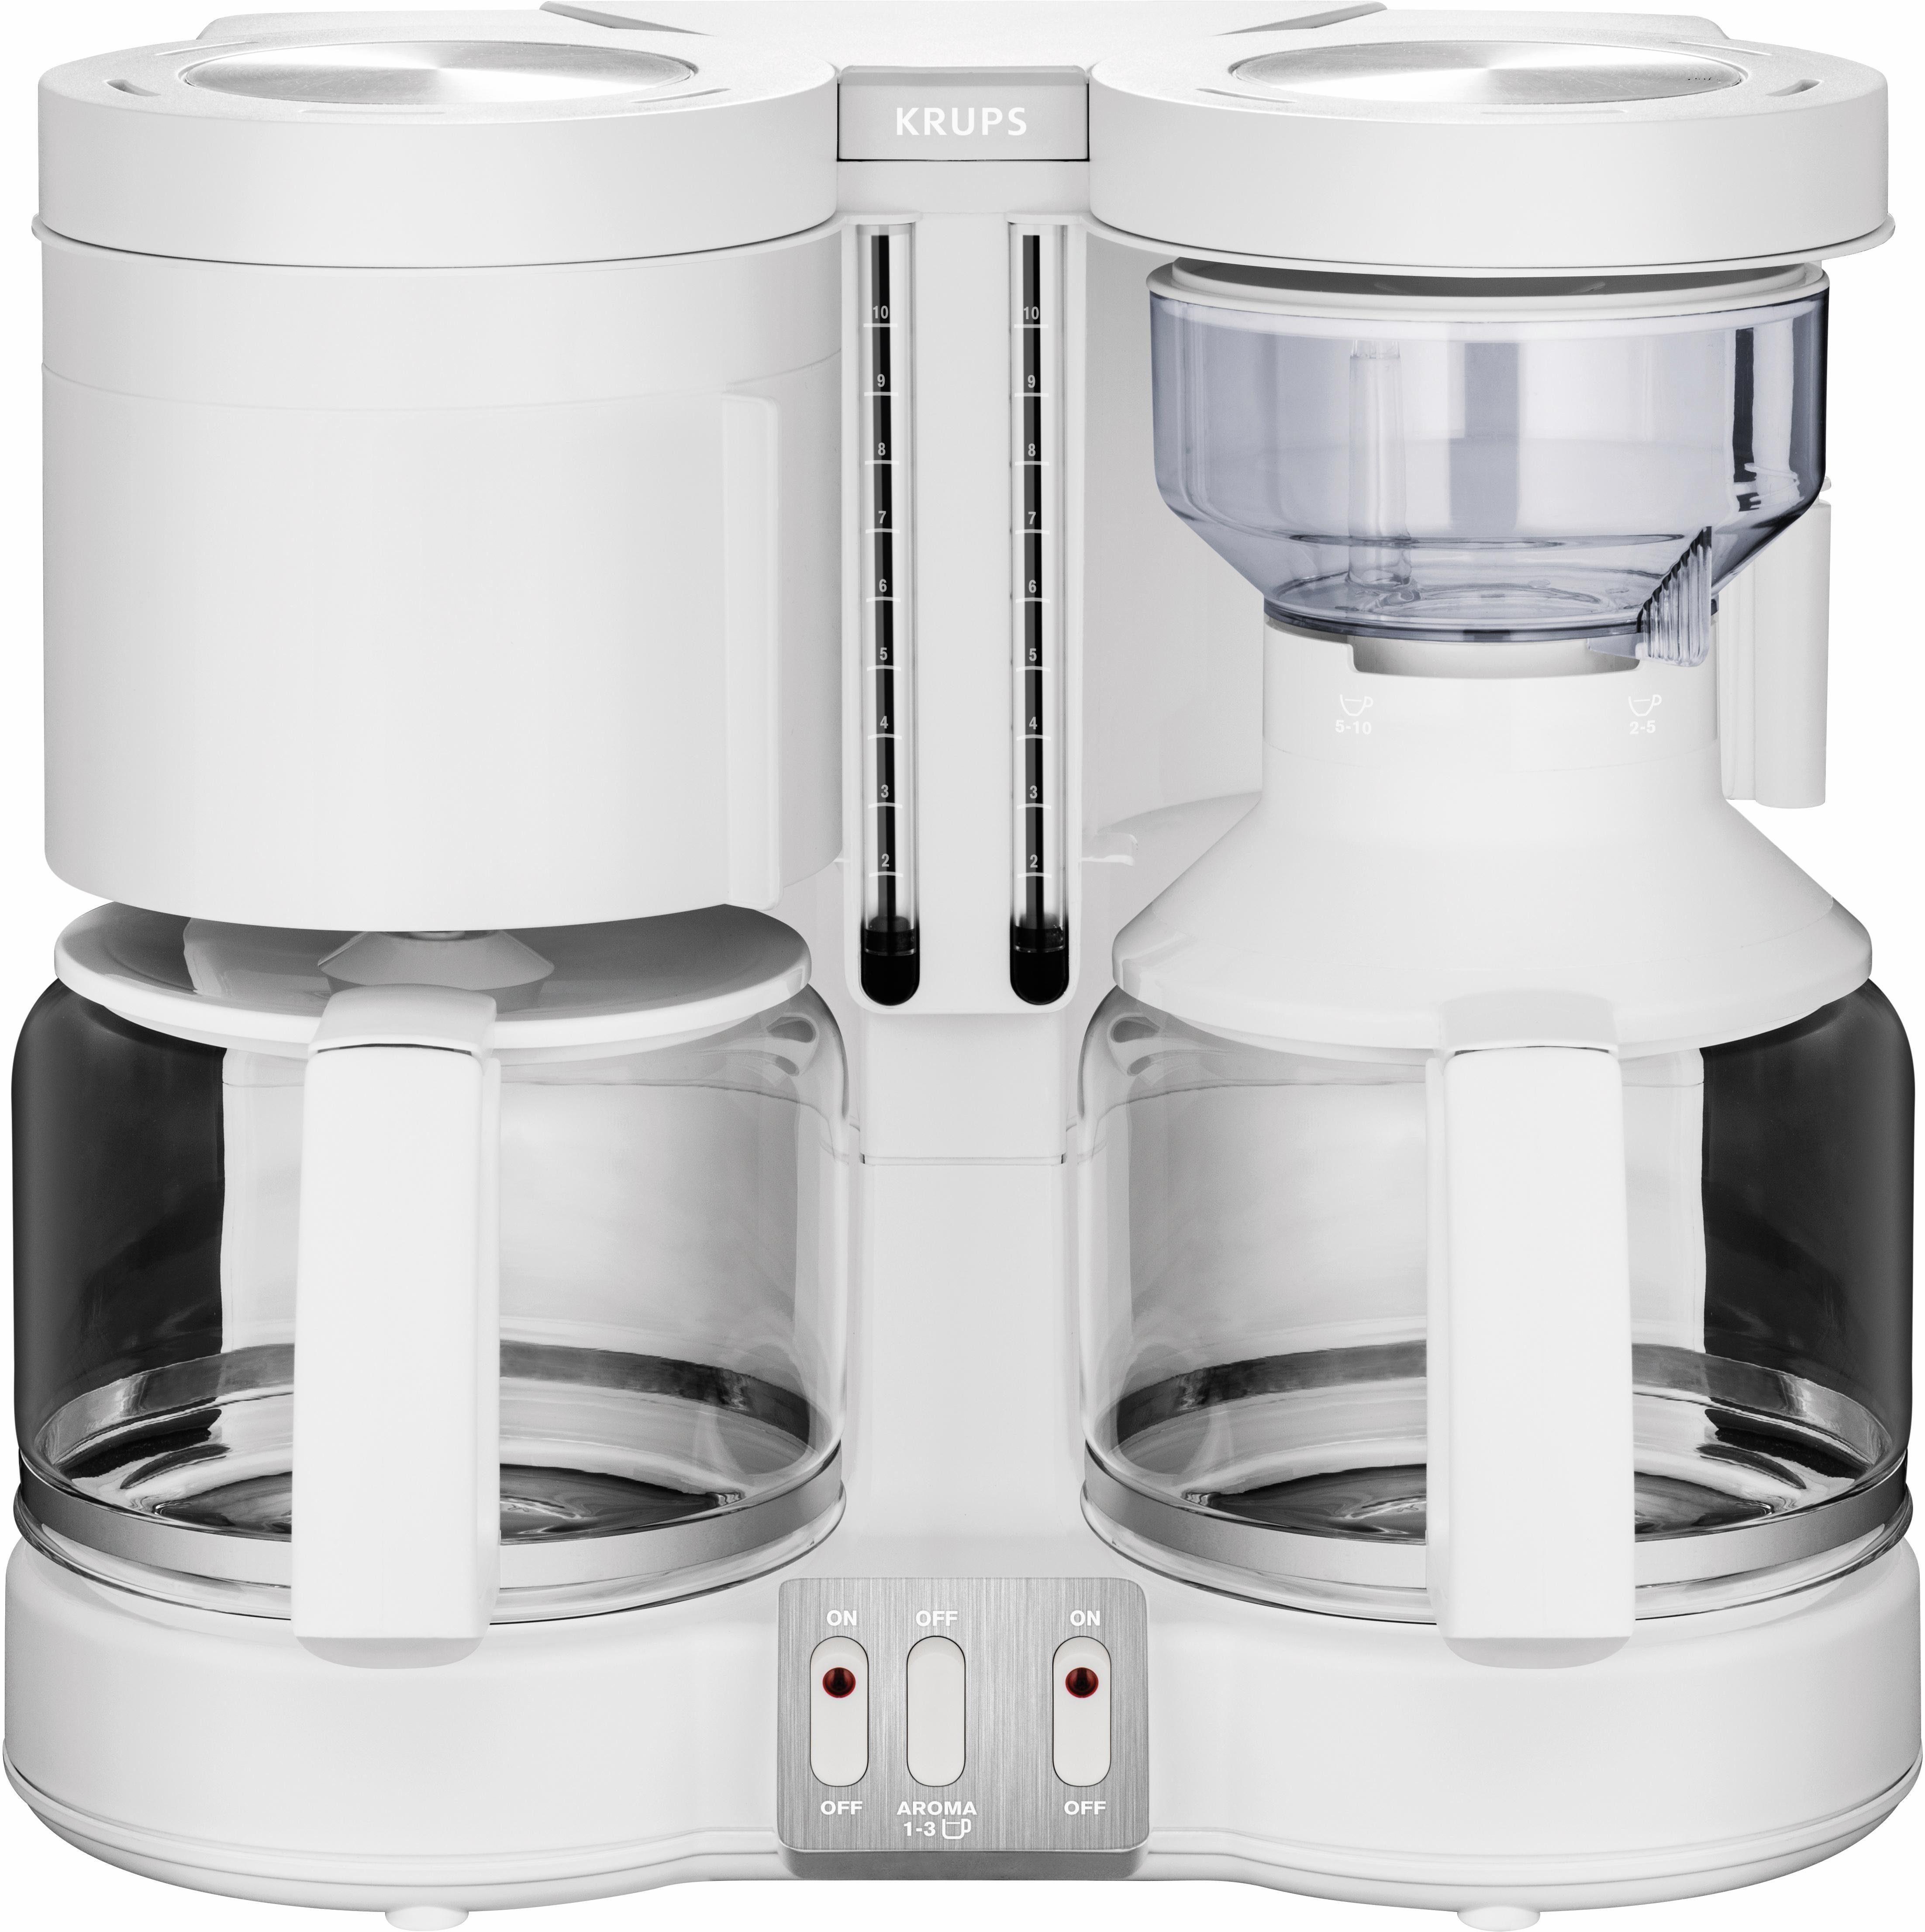 Krups Doppel-Filterkaffeemaschine Duothek Plus KM8501, weiß